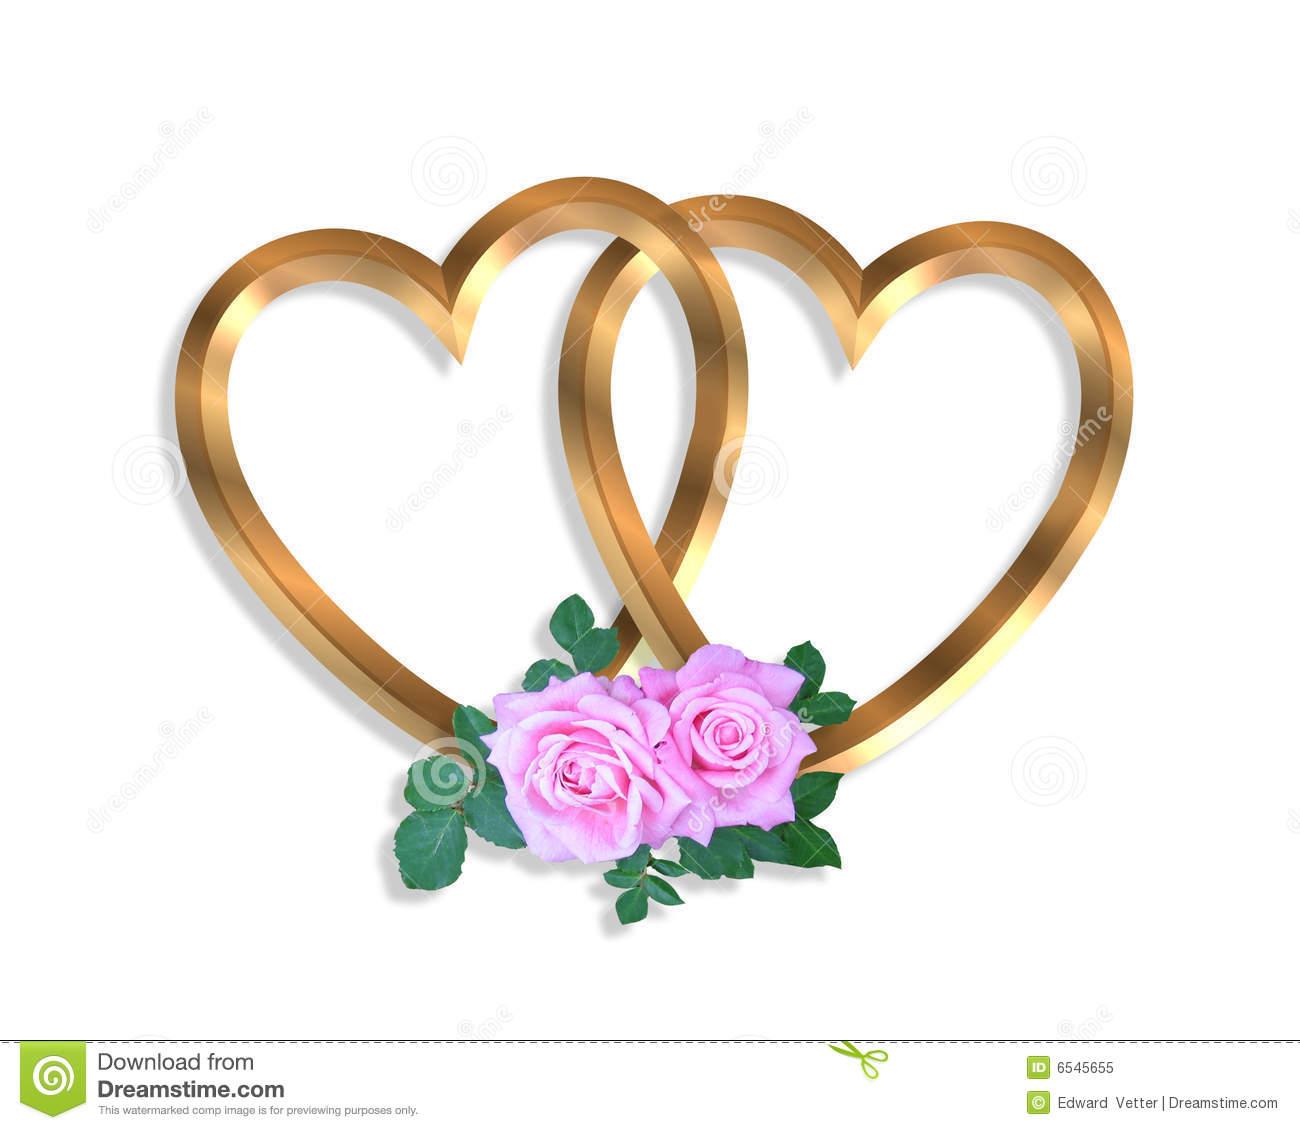 Wedding clipart hearts clipart transparent Wedding Heart   Free Download Clip Art   Free Clip Art   on ... clipart transparent